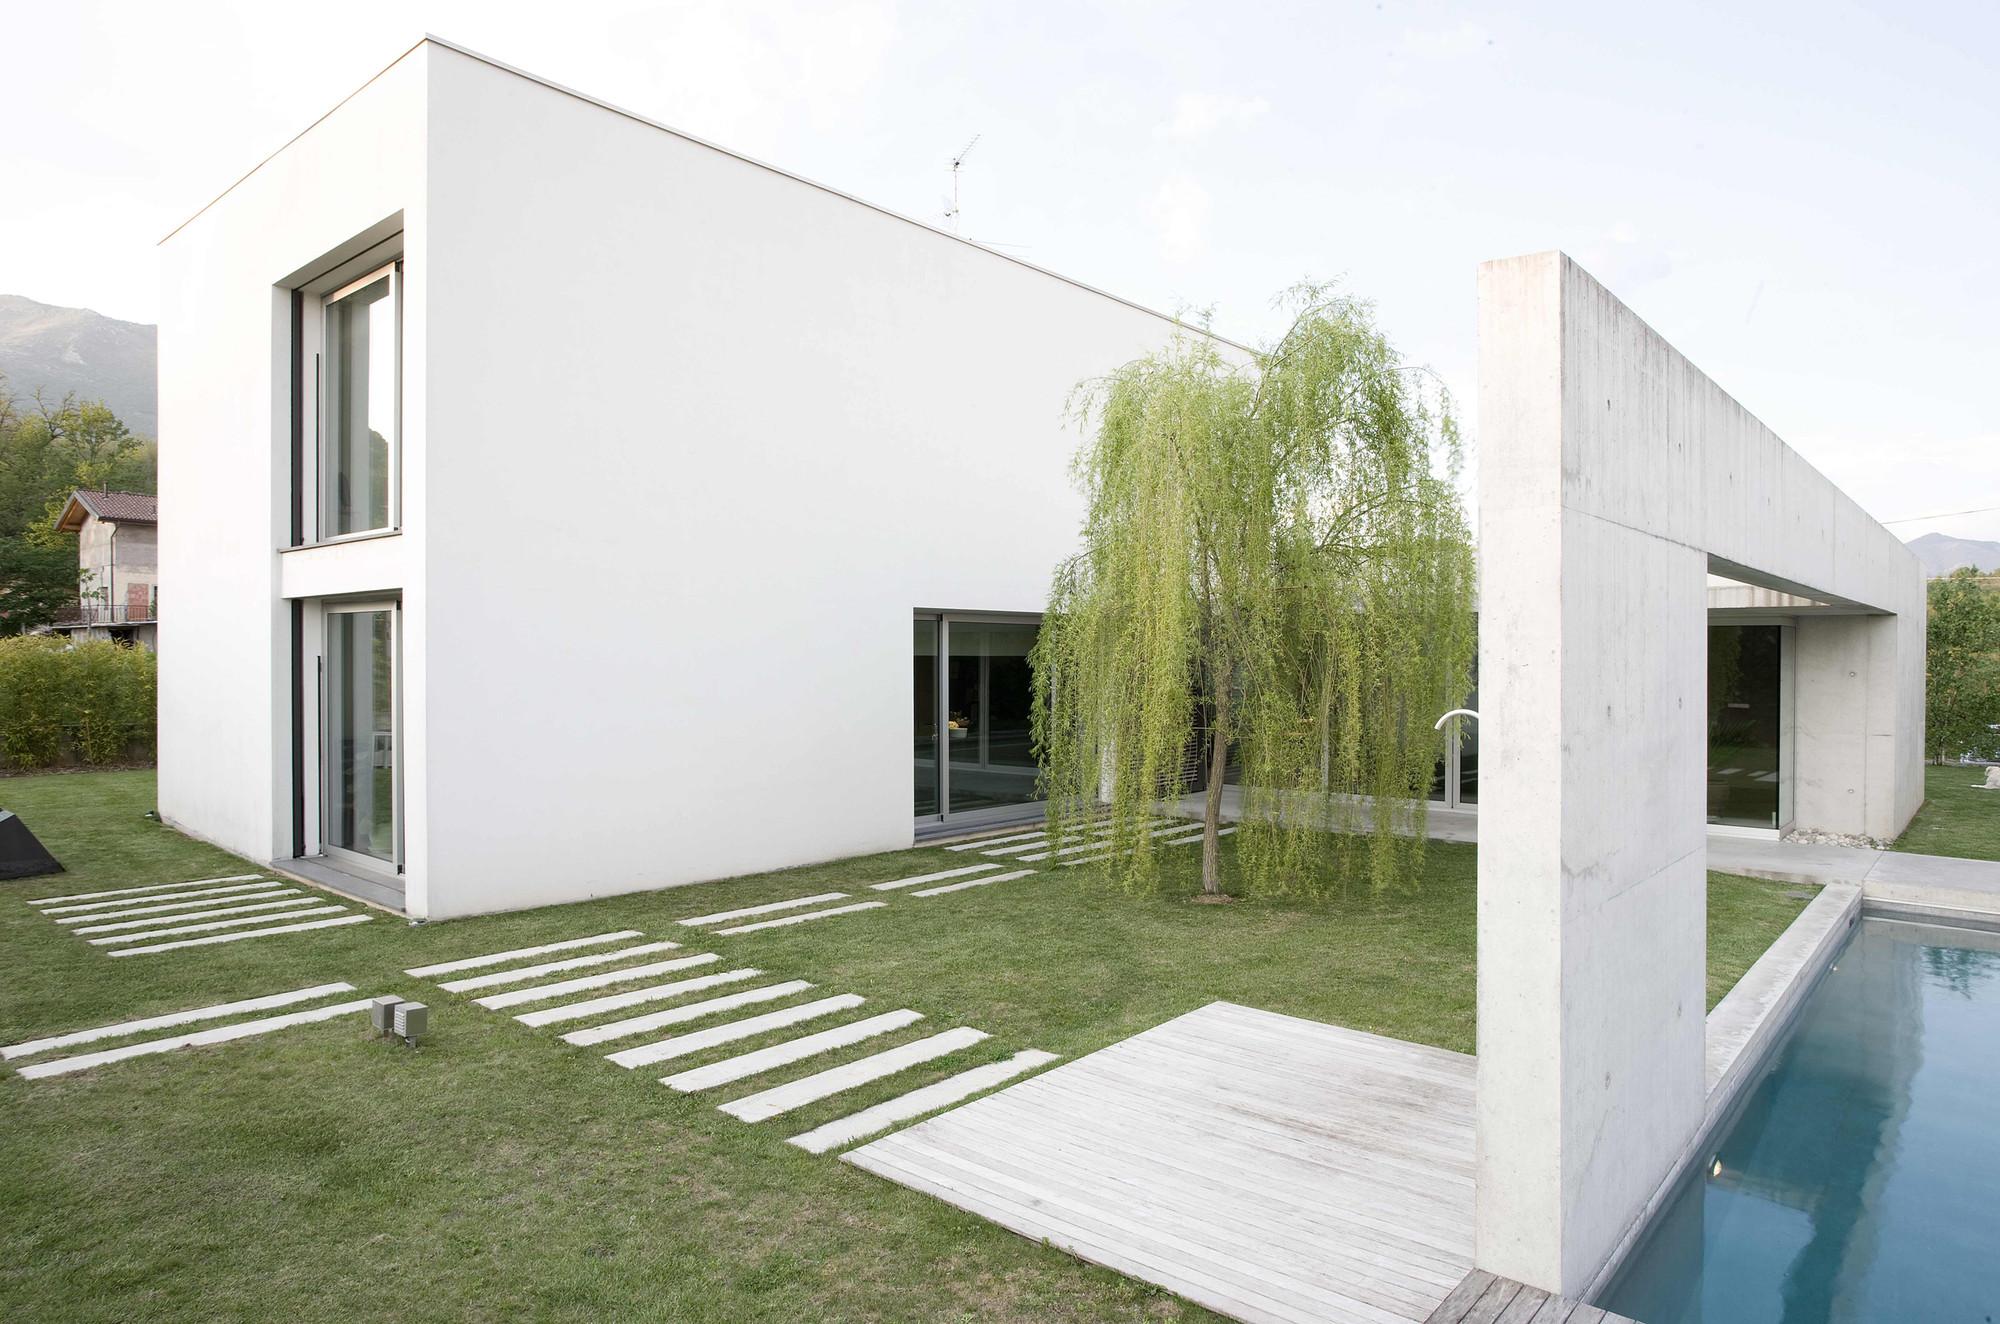 R+O House / Bianco + Gotti Architetti, © Luca Santiago Mora